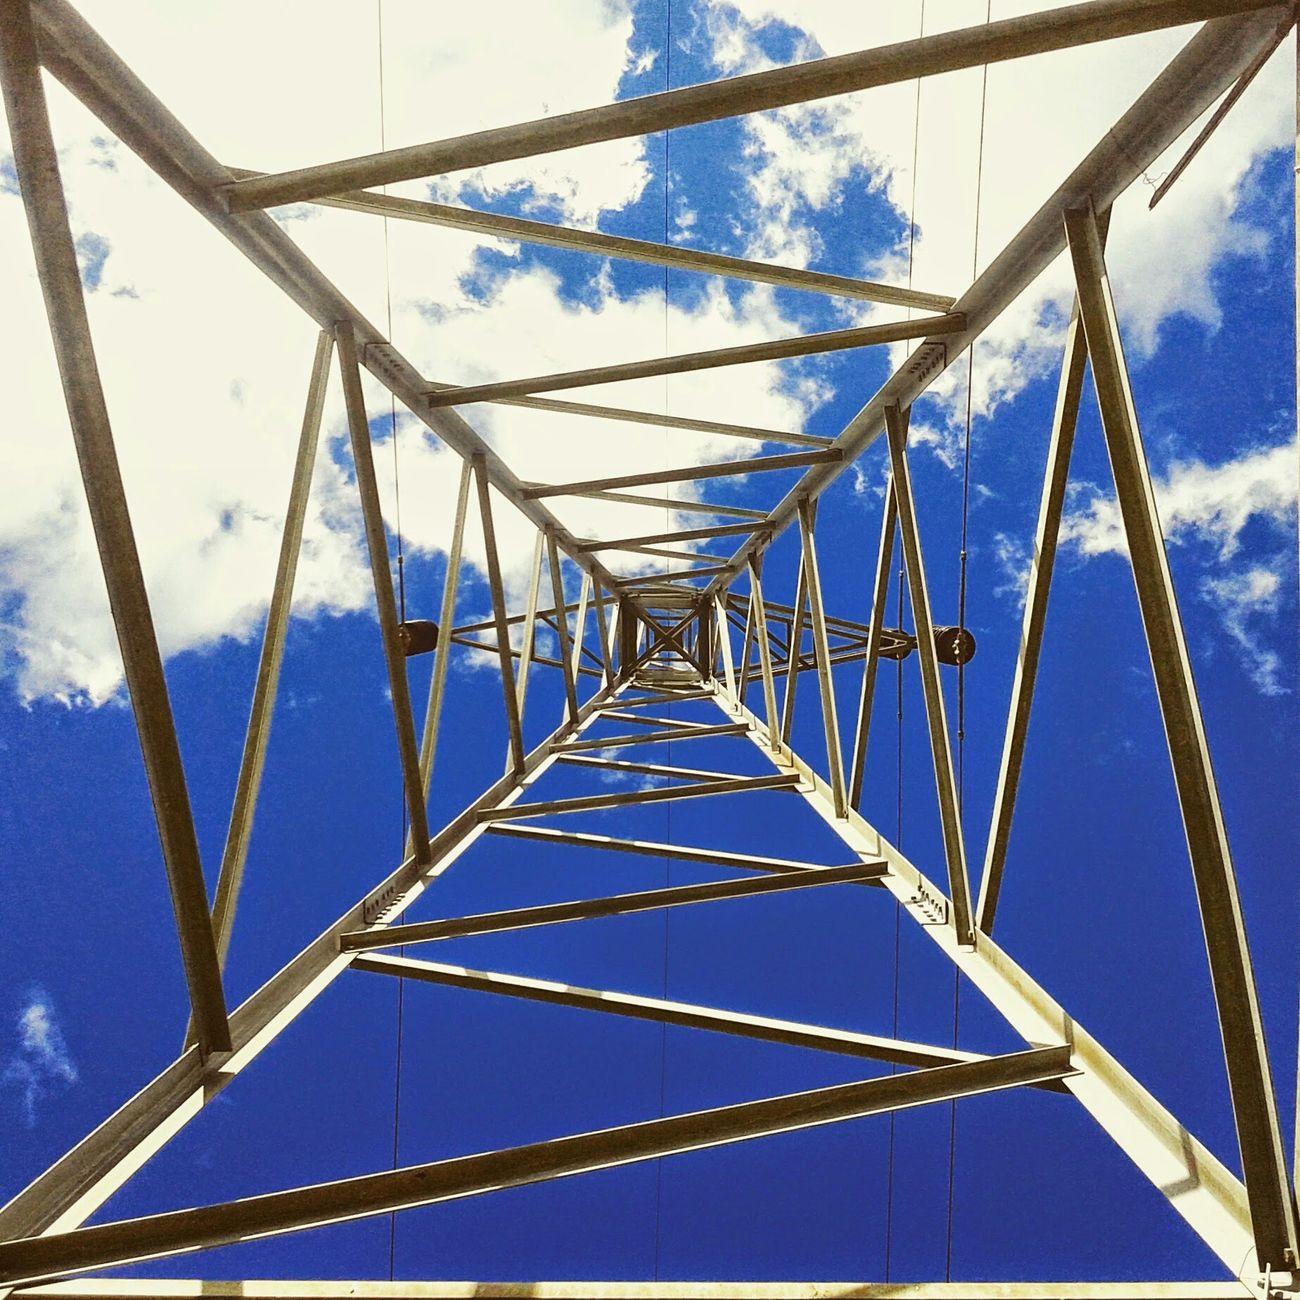 Sky Collection Skylove Bluesky Torre En Algun Lugar Del Universo Travis Barker' Universo Paralello Contemporain Umdiaporvez Bonjour.♥ Mira